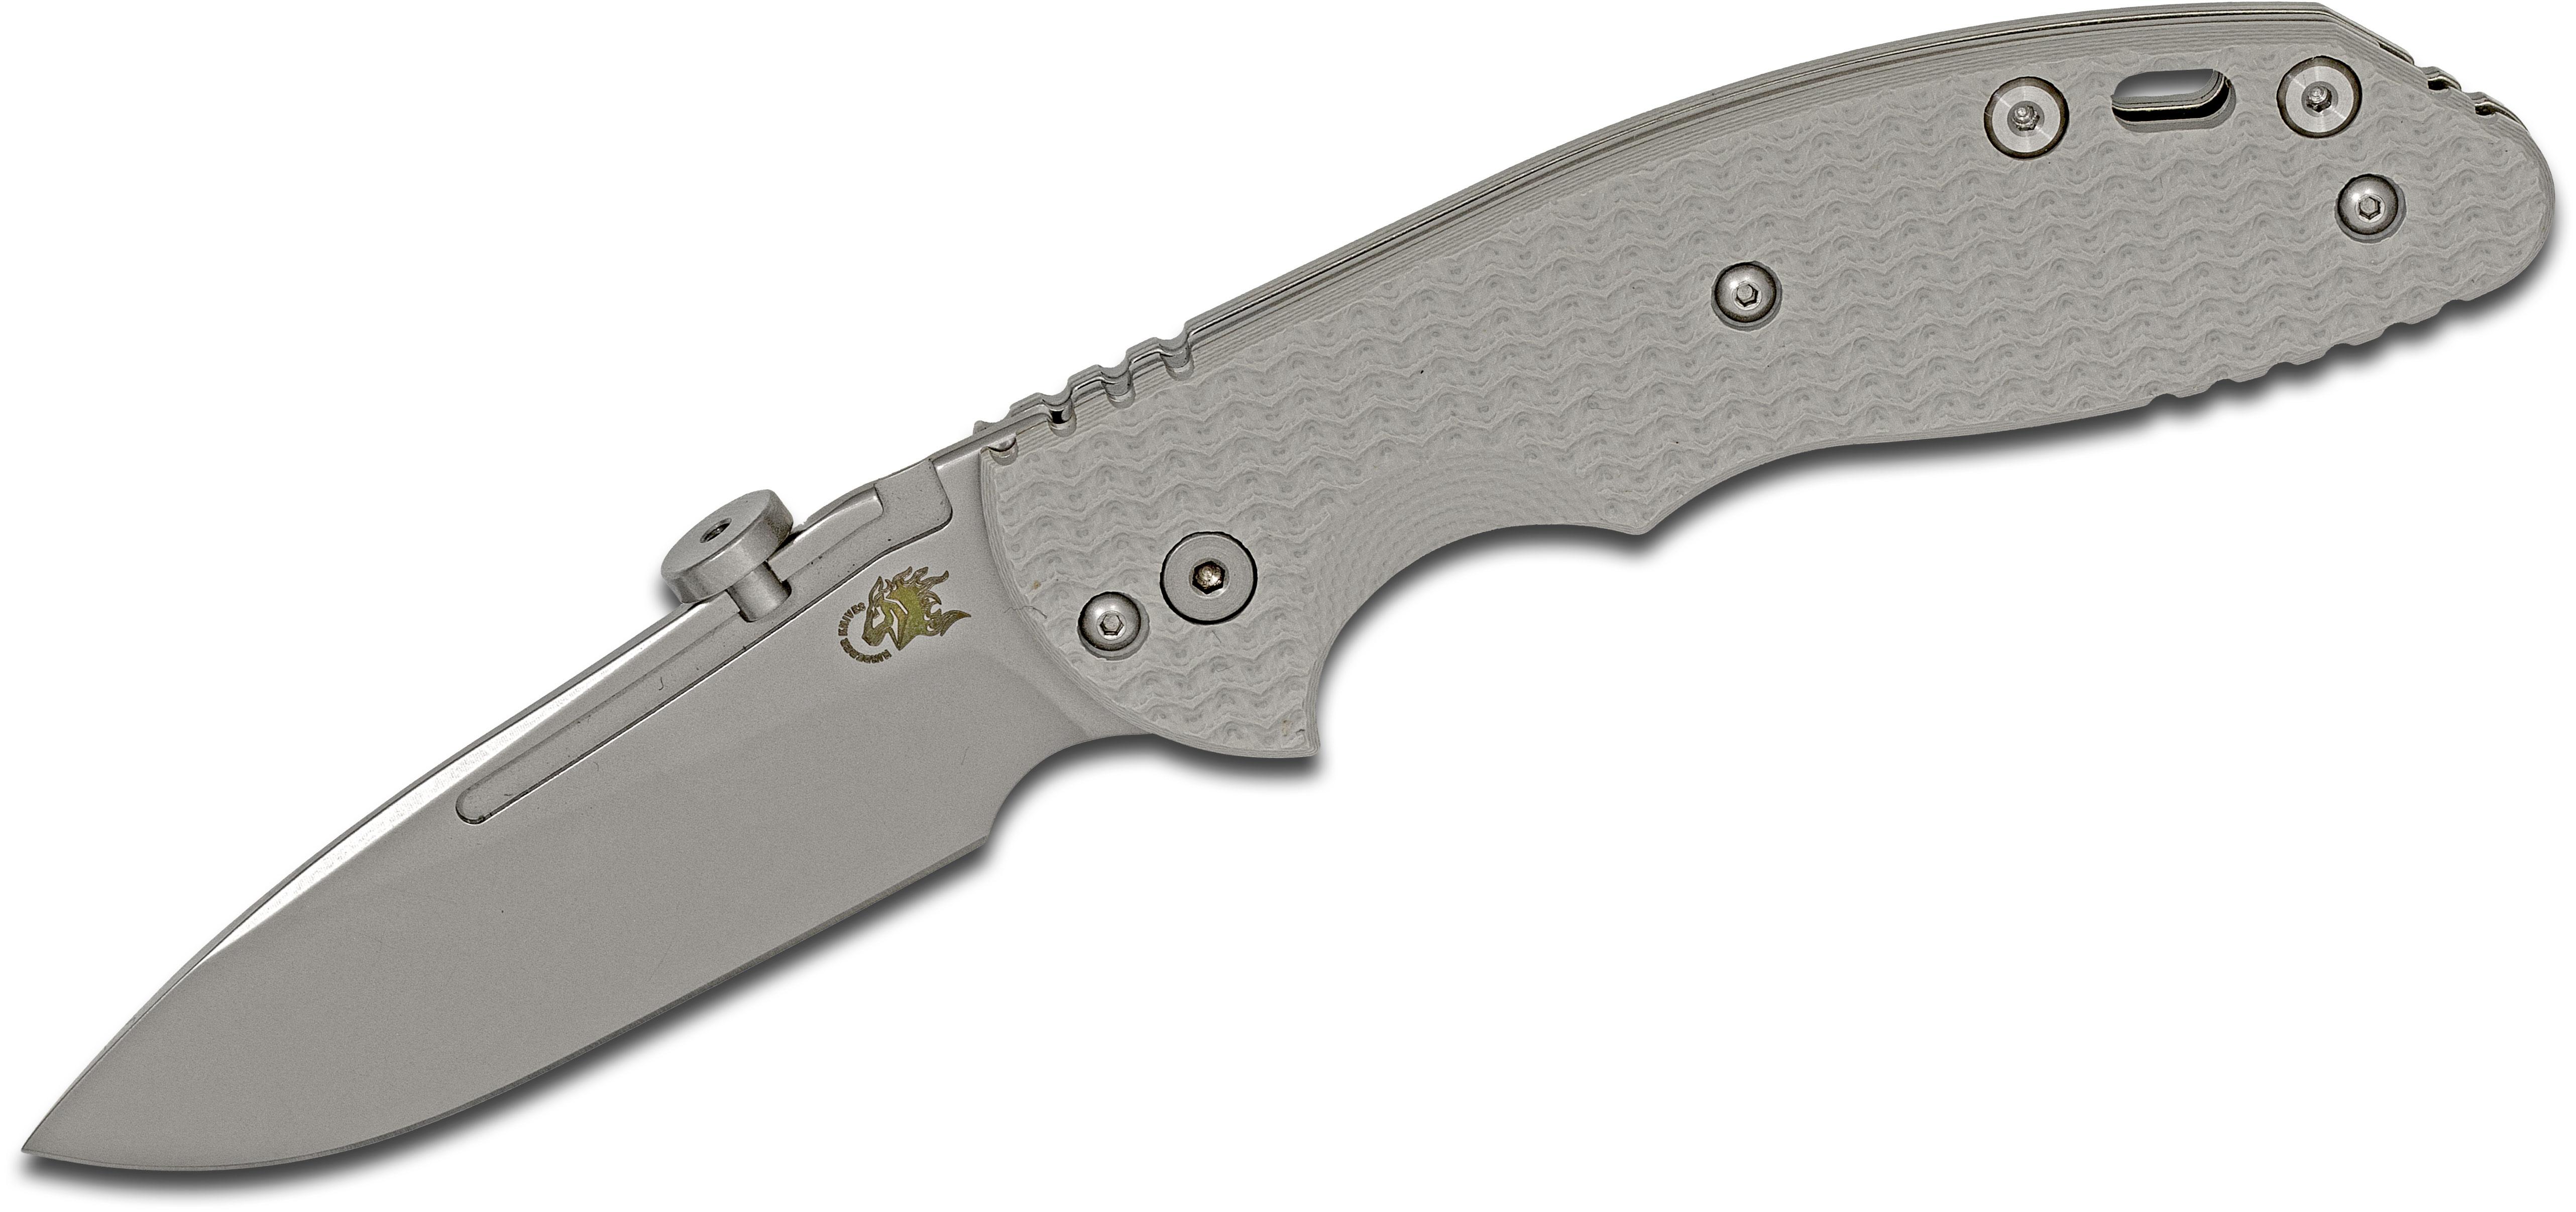 Rick Hinderer Knives XM-18 Slipjoint Folding Knife 3 inch CPM-20CV Stonewashed Slicer Blade, Gray G10 Handles